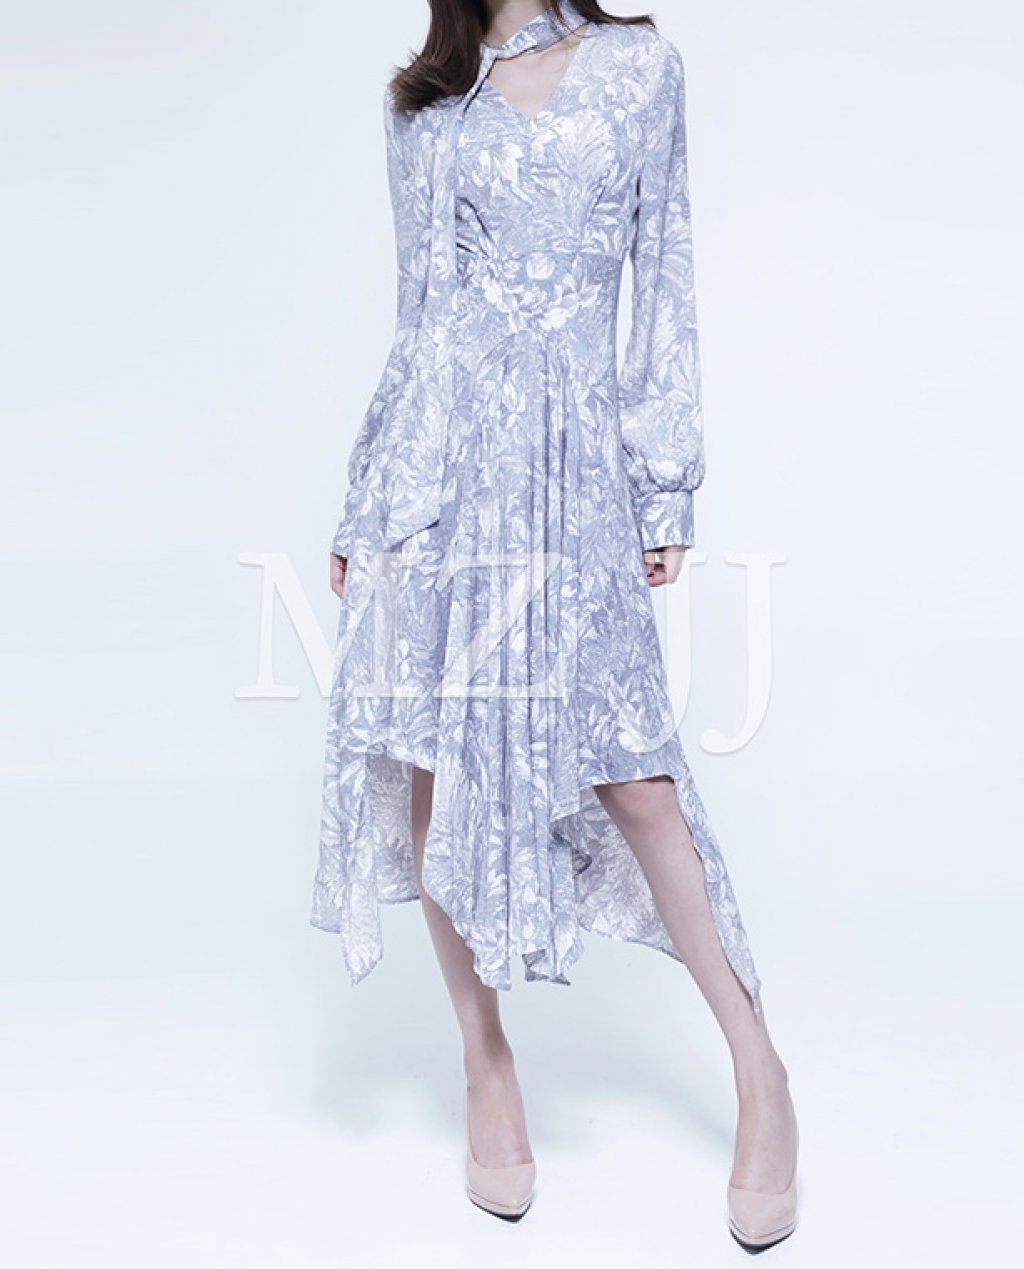 OP13521LGY Dress